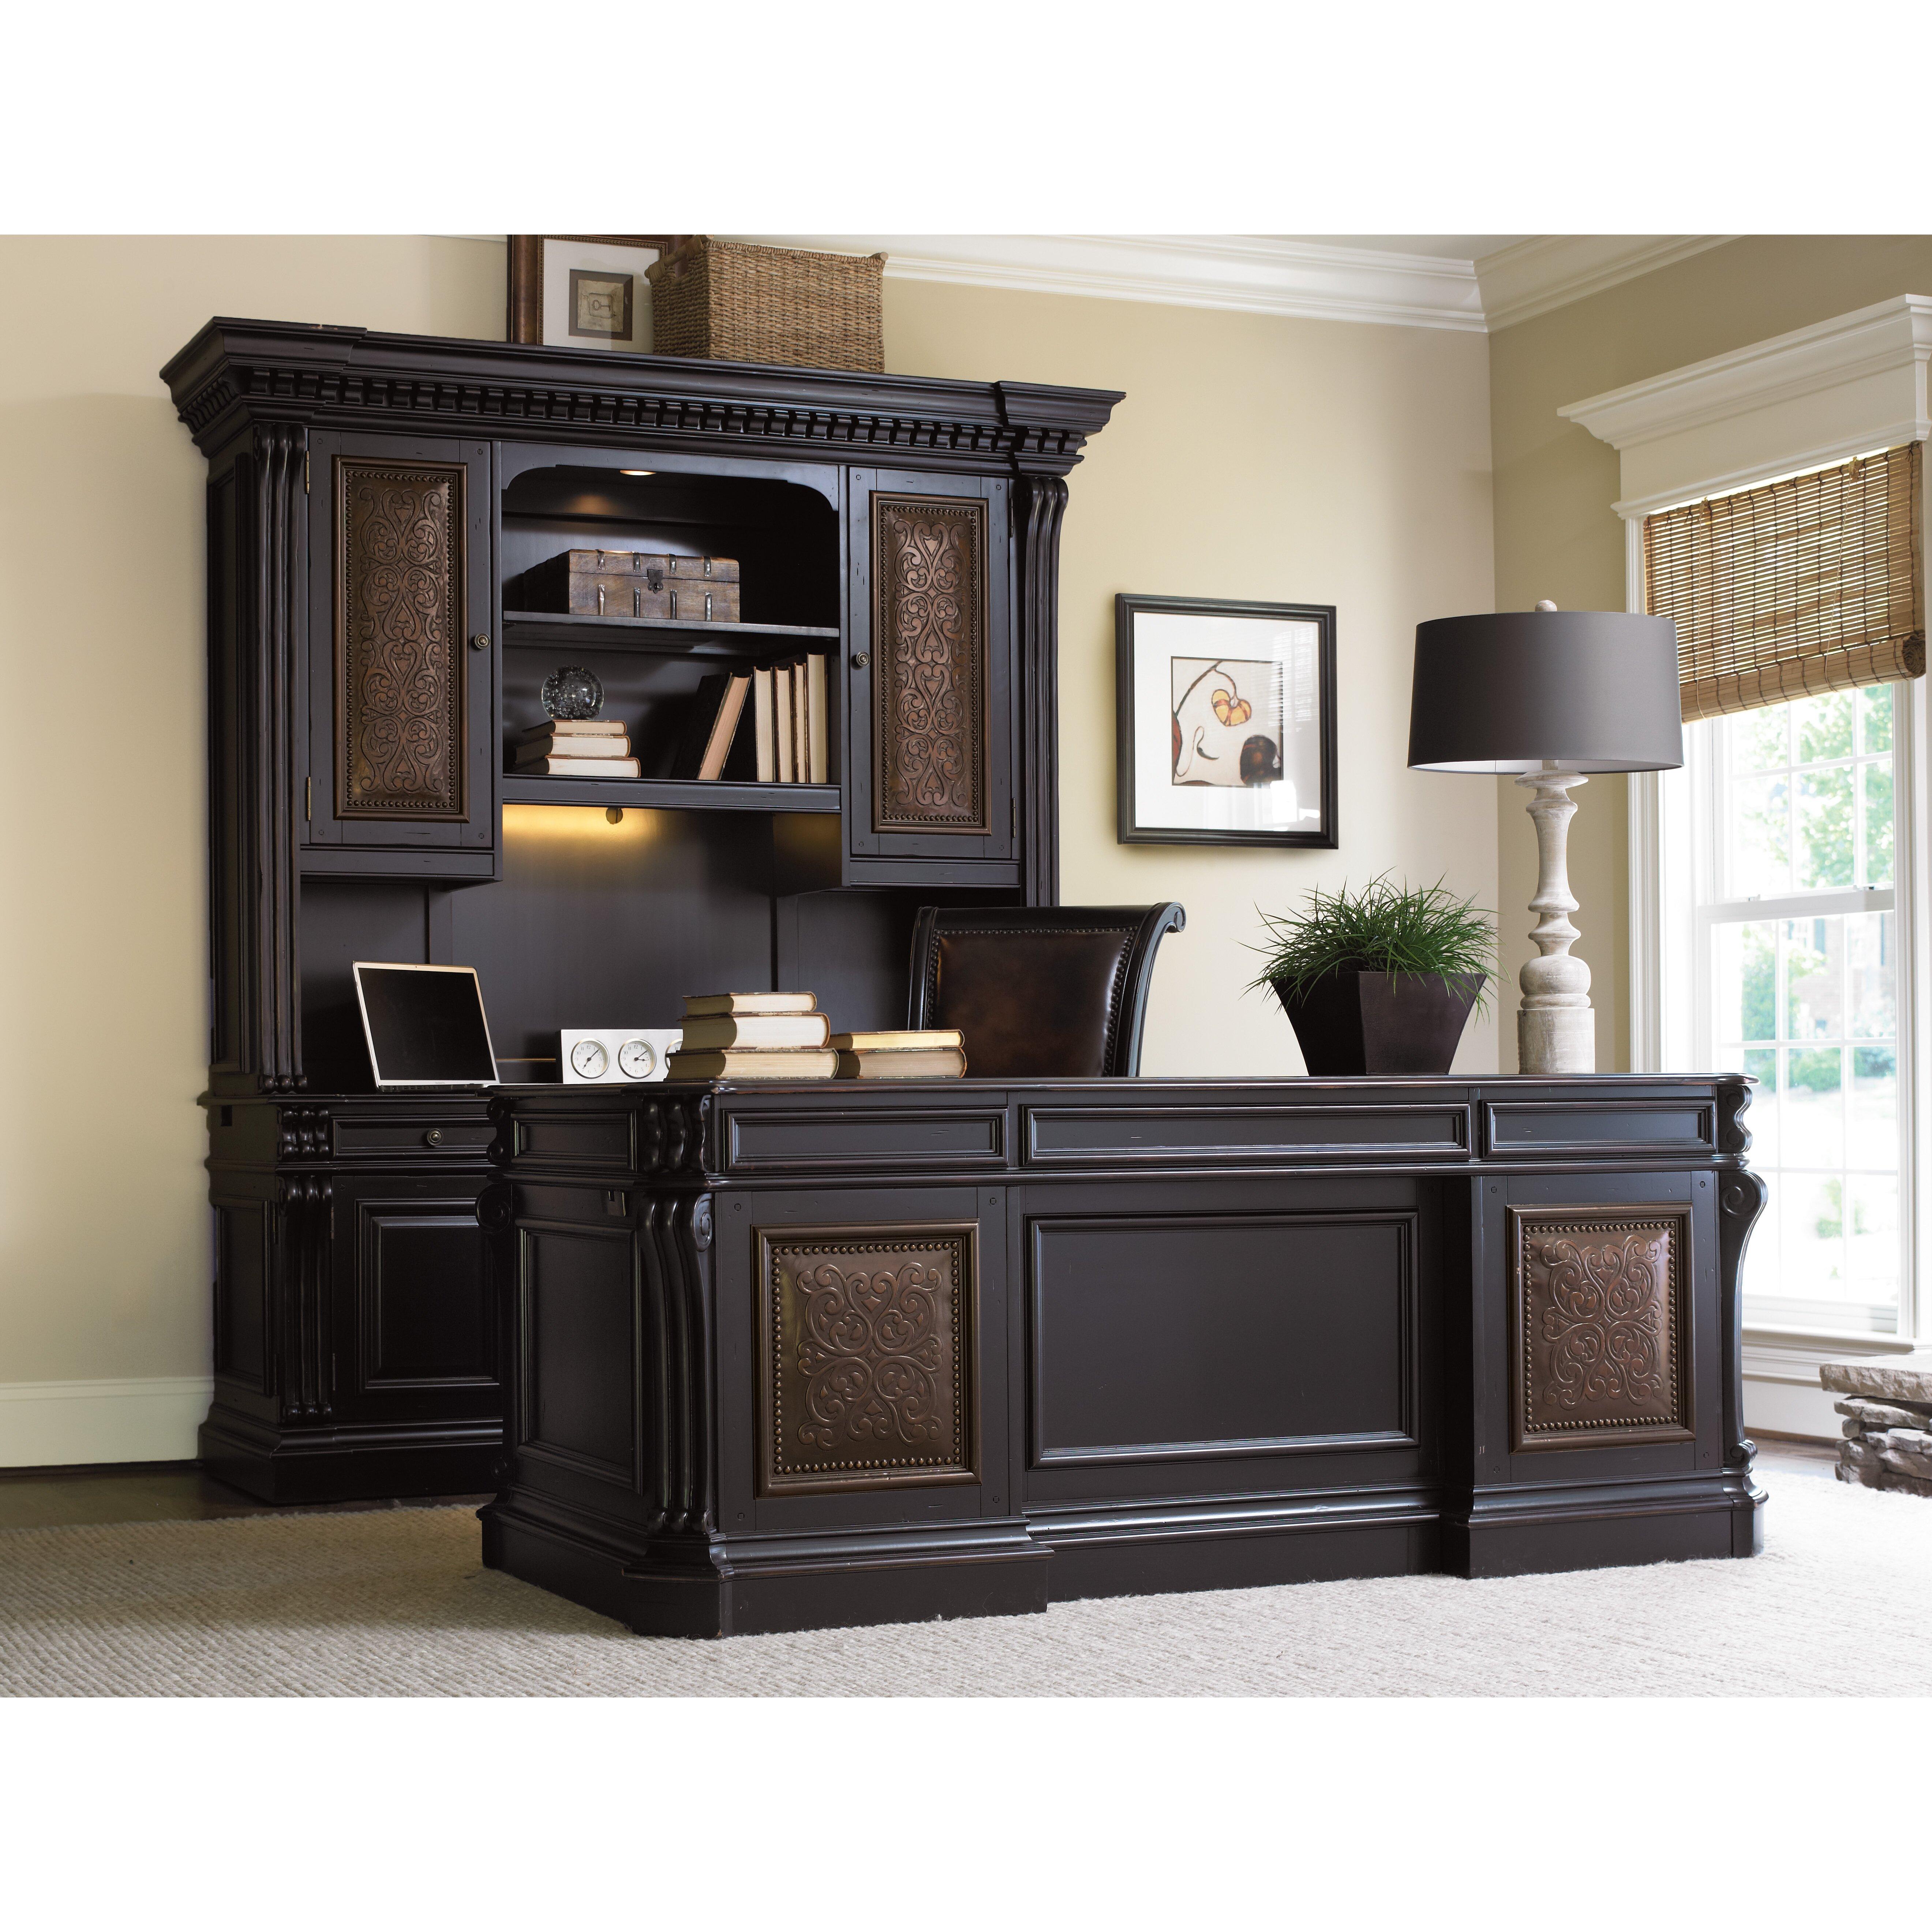 Hooker Furniture Telluride Executive Desk With Keyboard